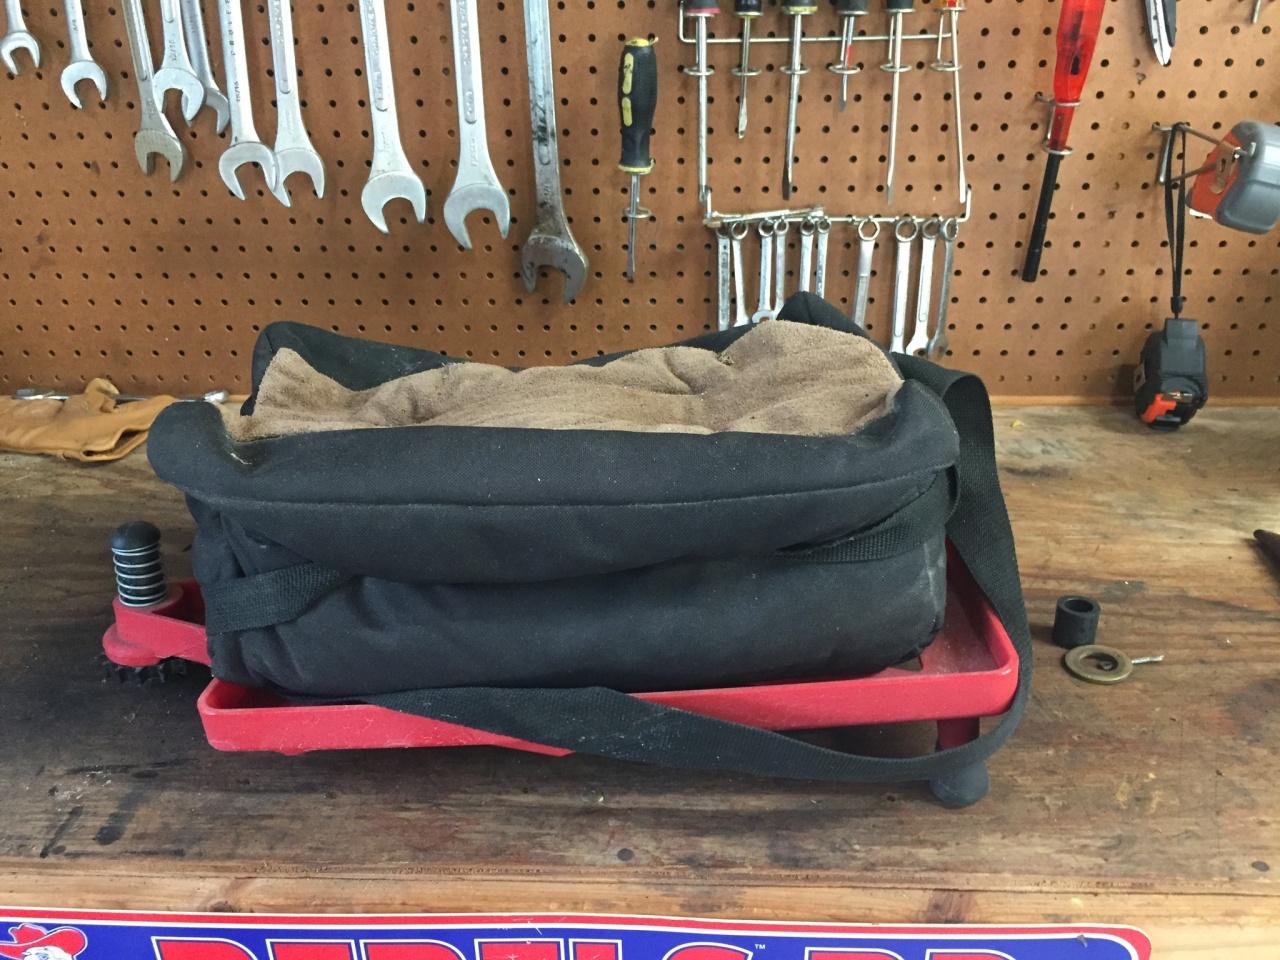 Tasco Sotting Scope and Shooting Bag-4fc0f740-d305-4bc6-a006-def86b9754da-jpg